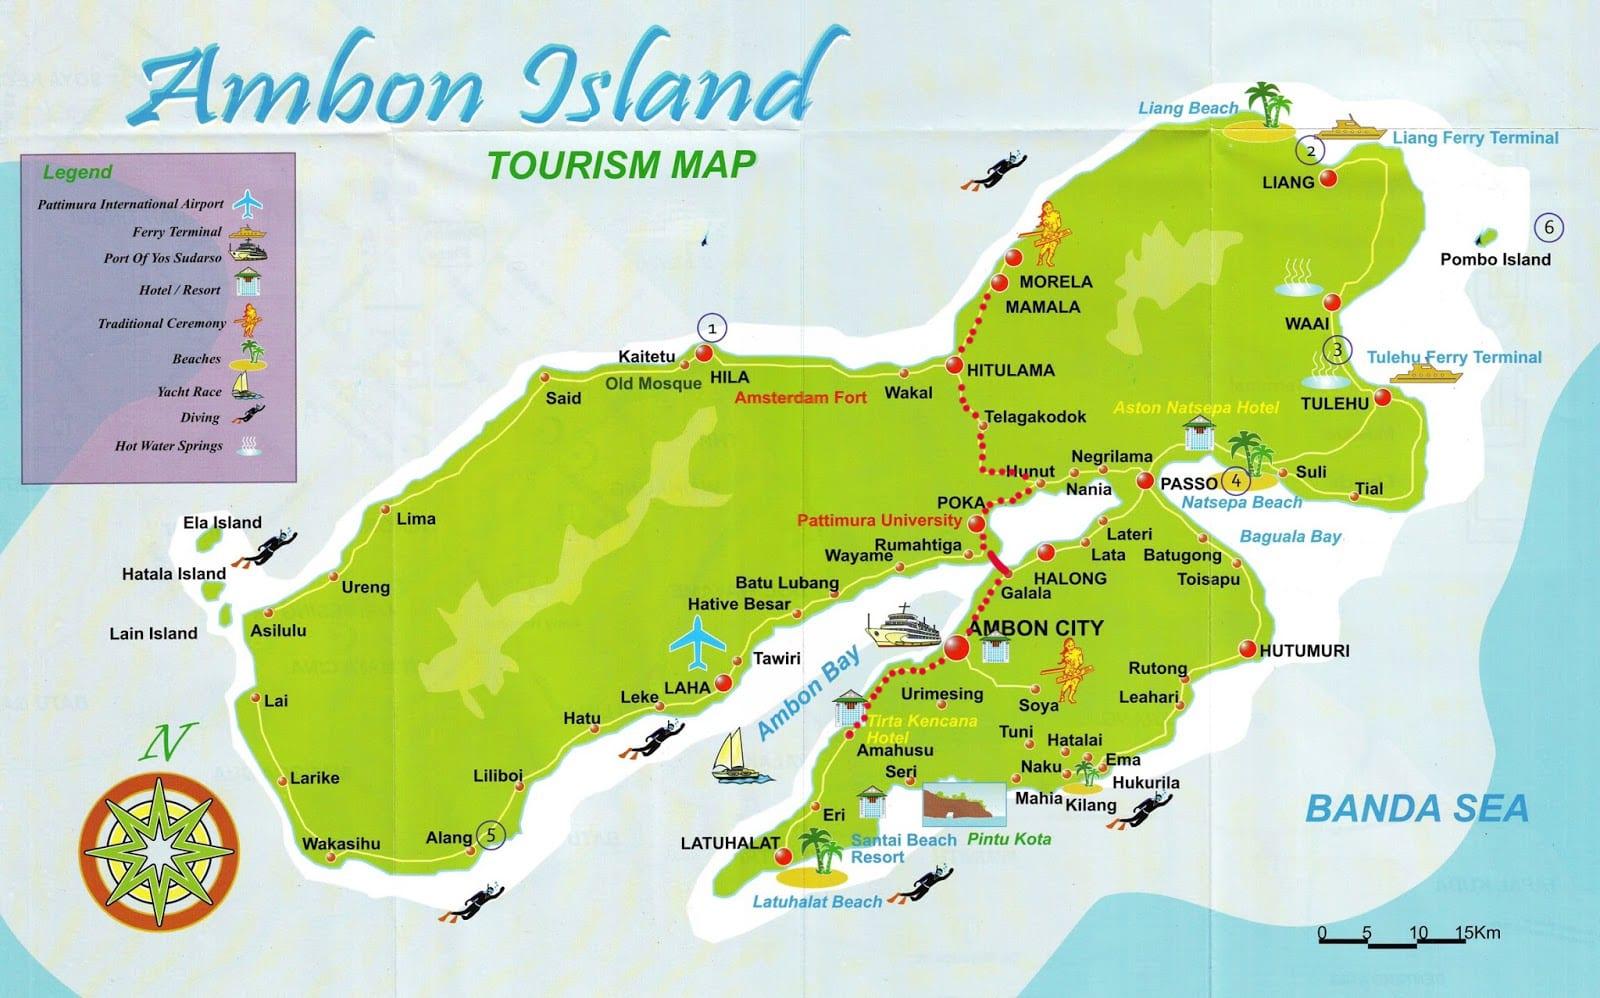 Остров Амбон, Индонезия - Практические путешествия